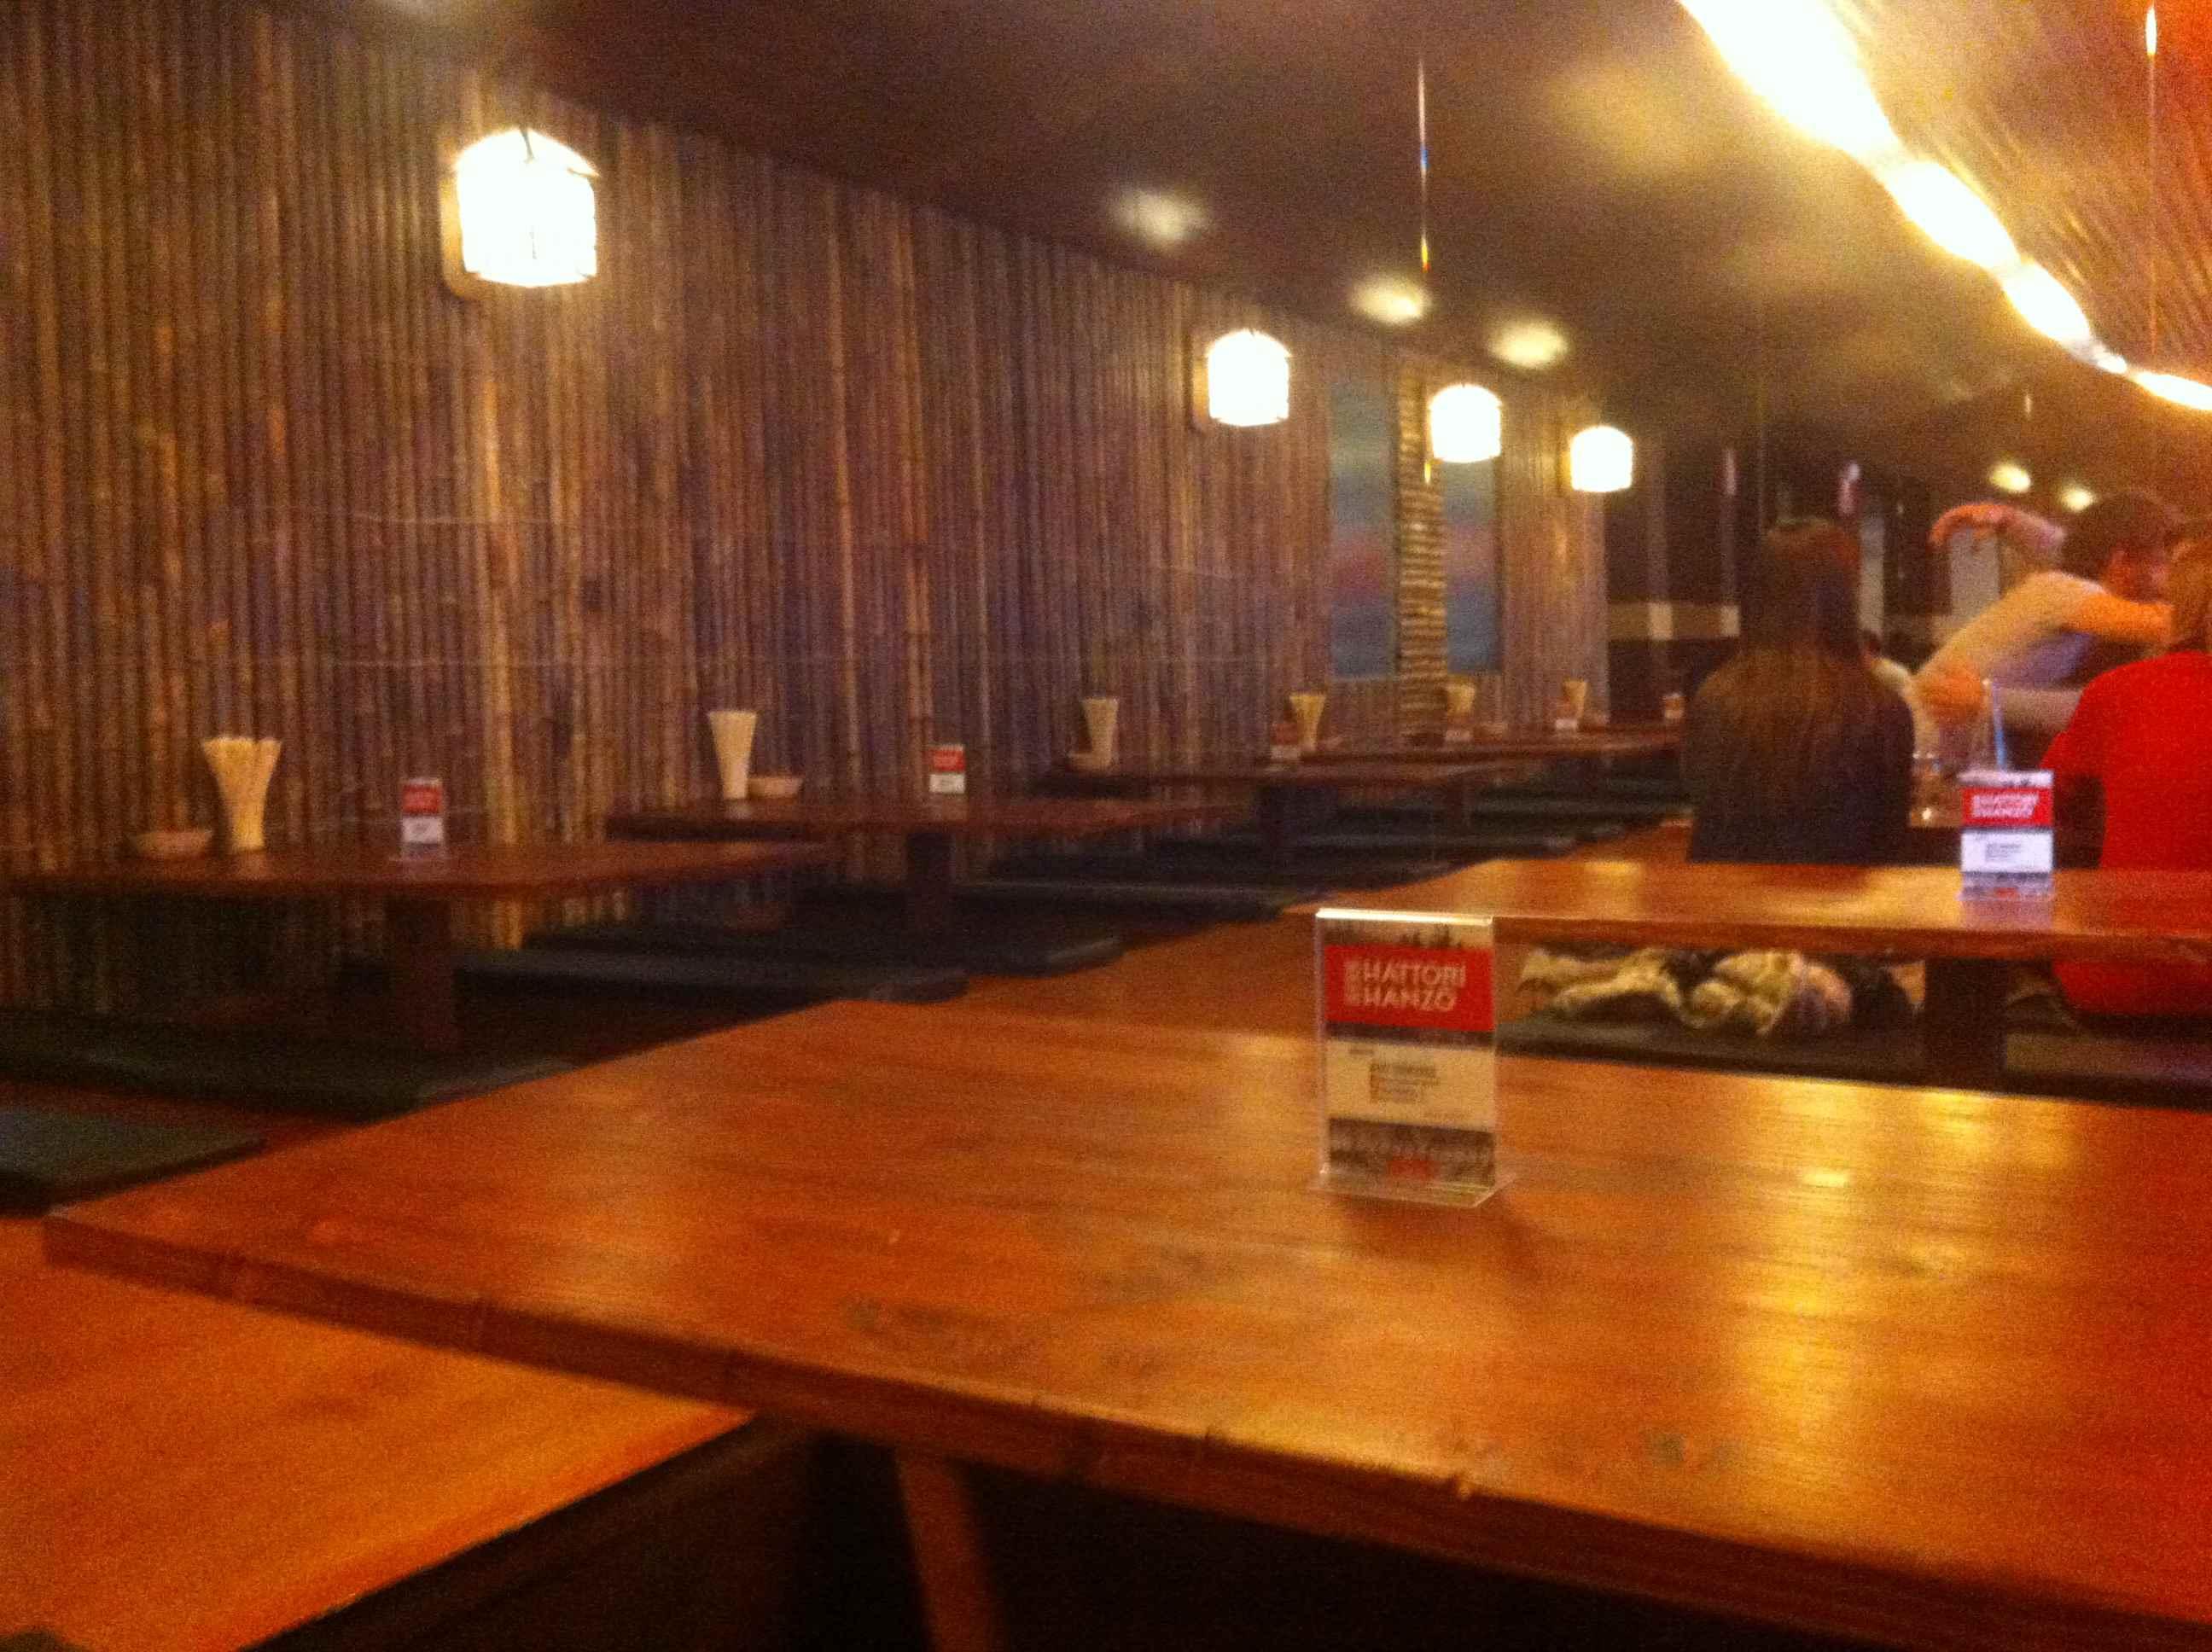 Mesas Bajas - Hattori Hanzo - Restaurante japones